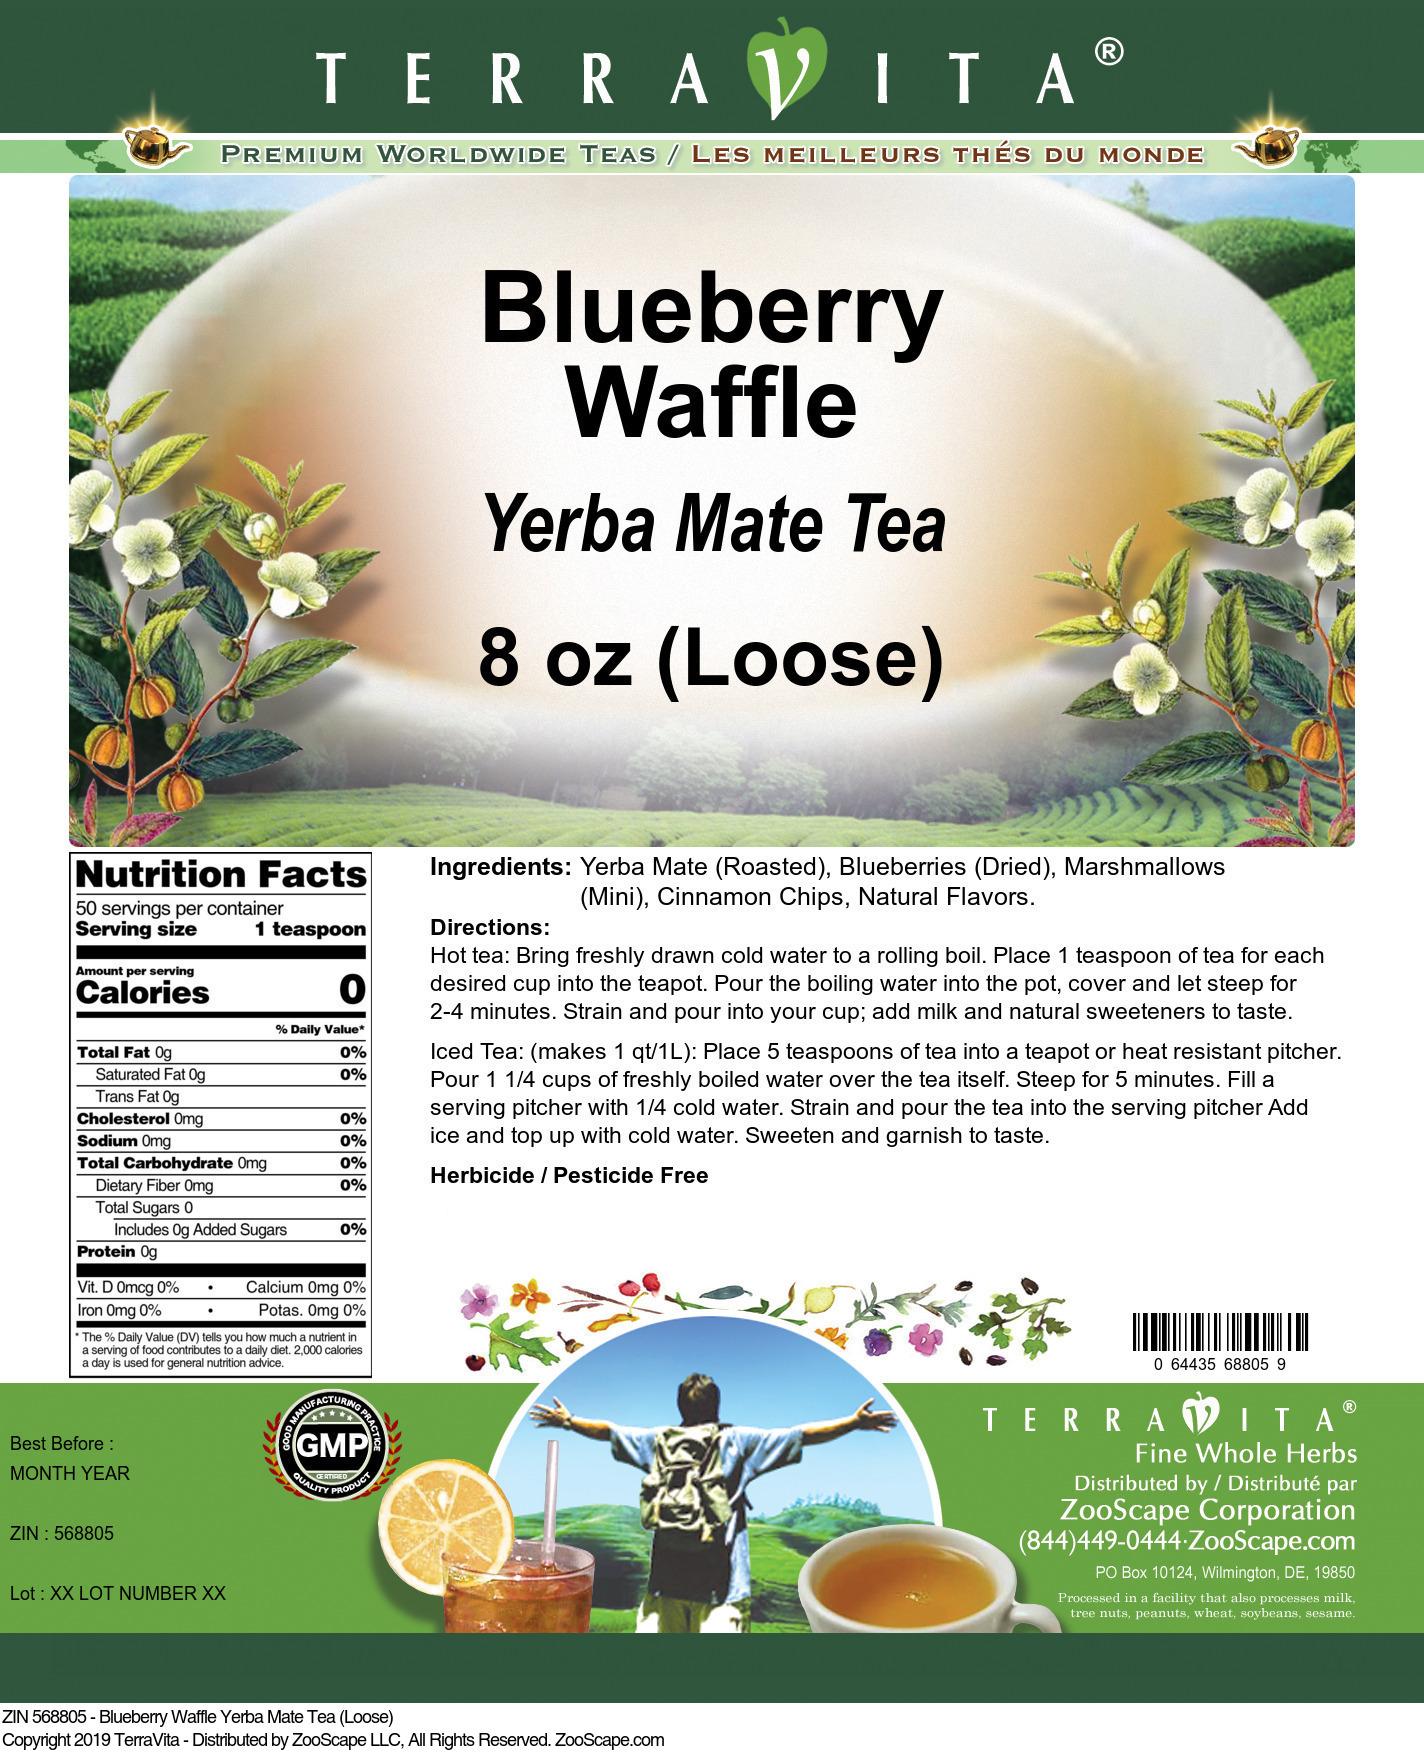 Blueberry Waffle Yerba Mate Tea (Loose)